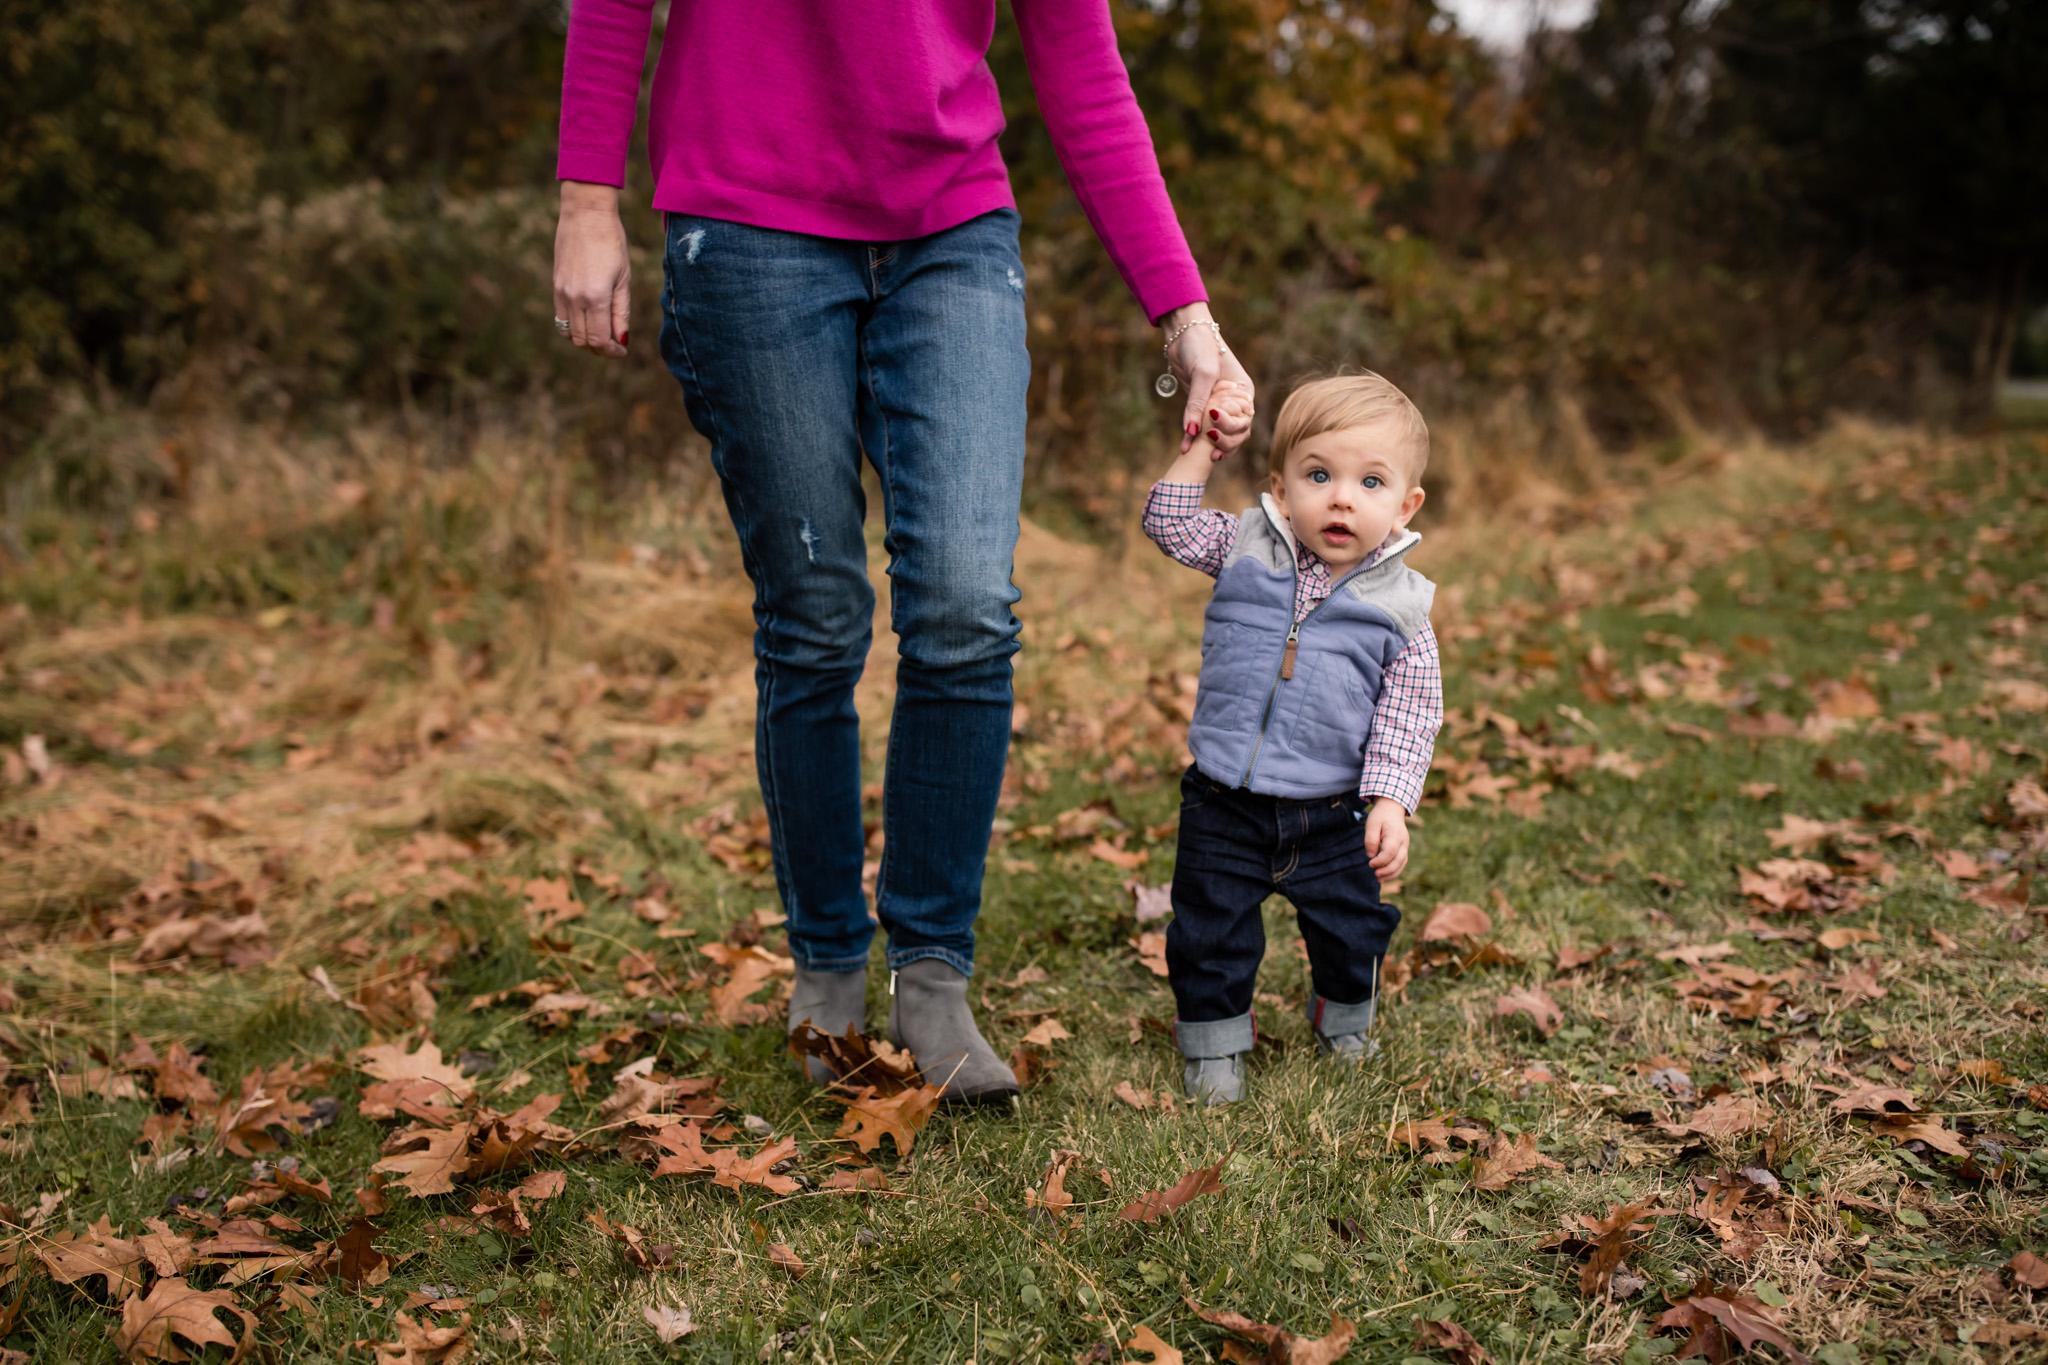 AnneMarie-Hamant-Lehigh Valley PA photographer-www.annemariehamant.com-38.jpg